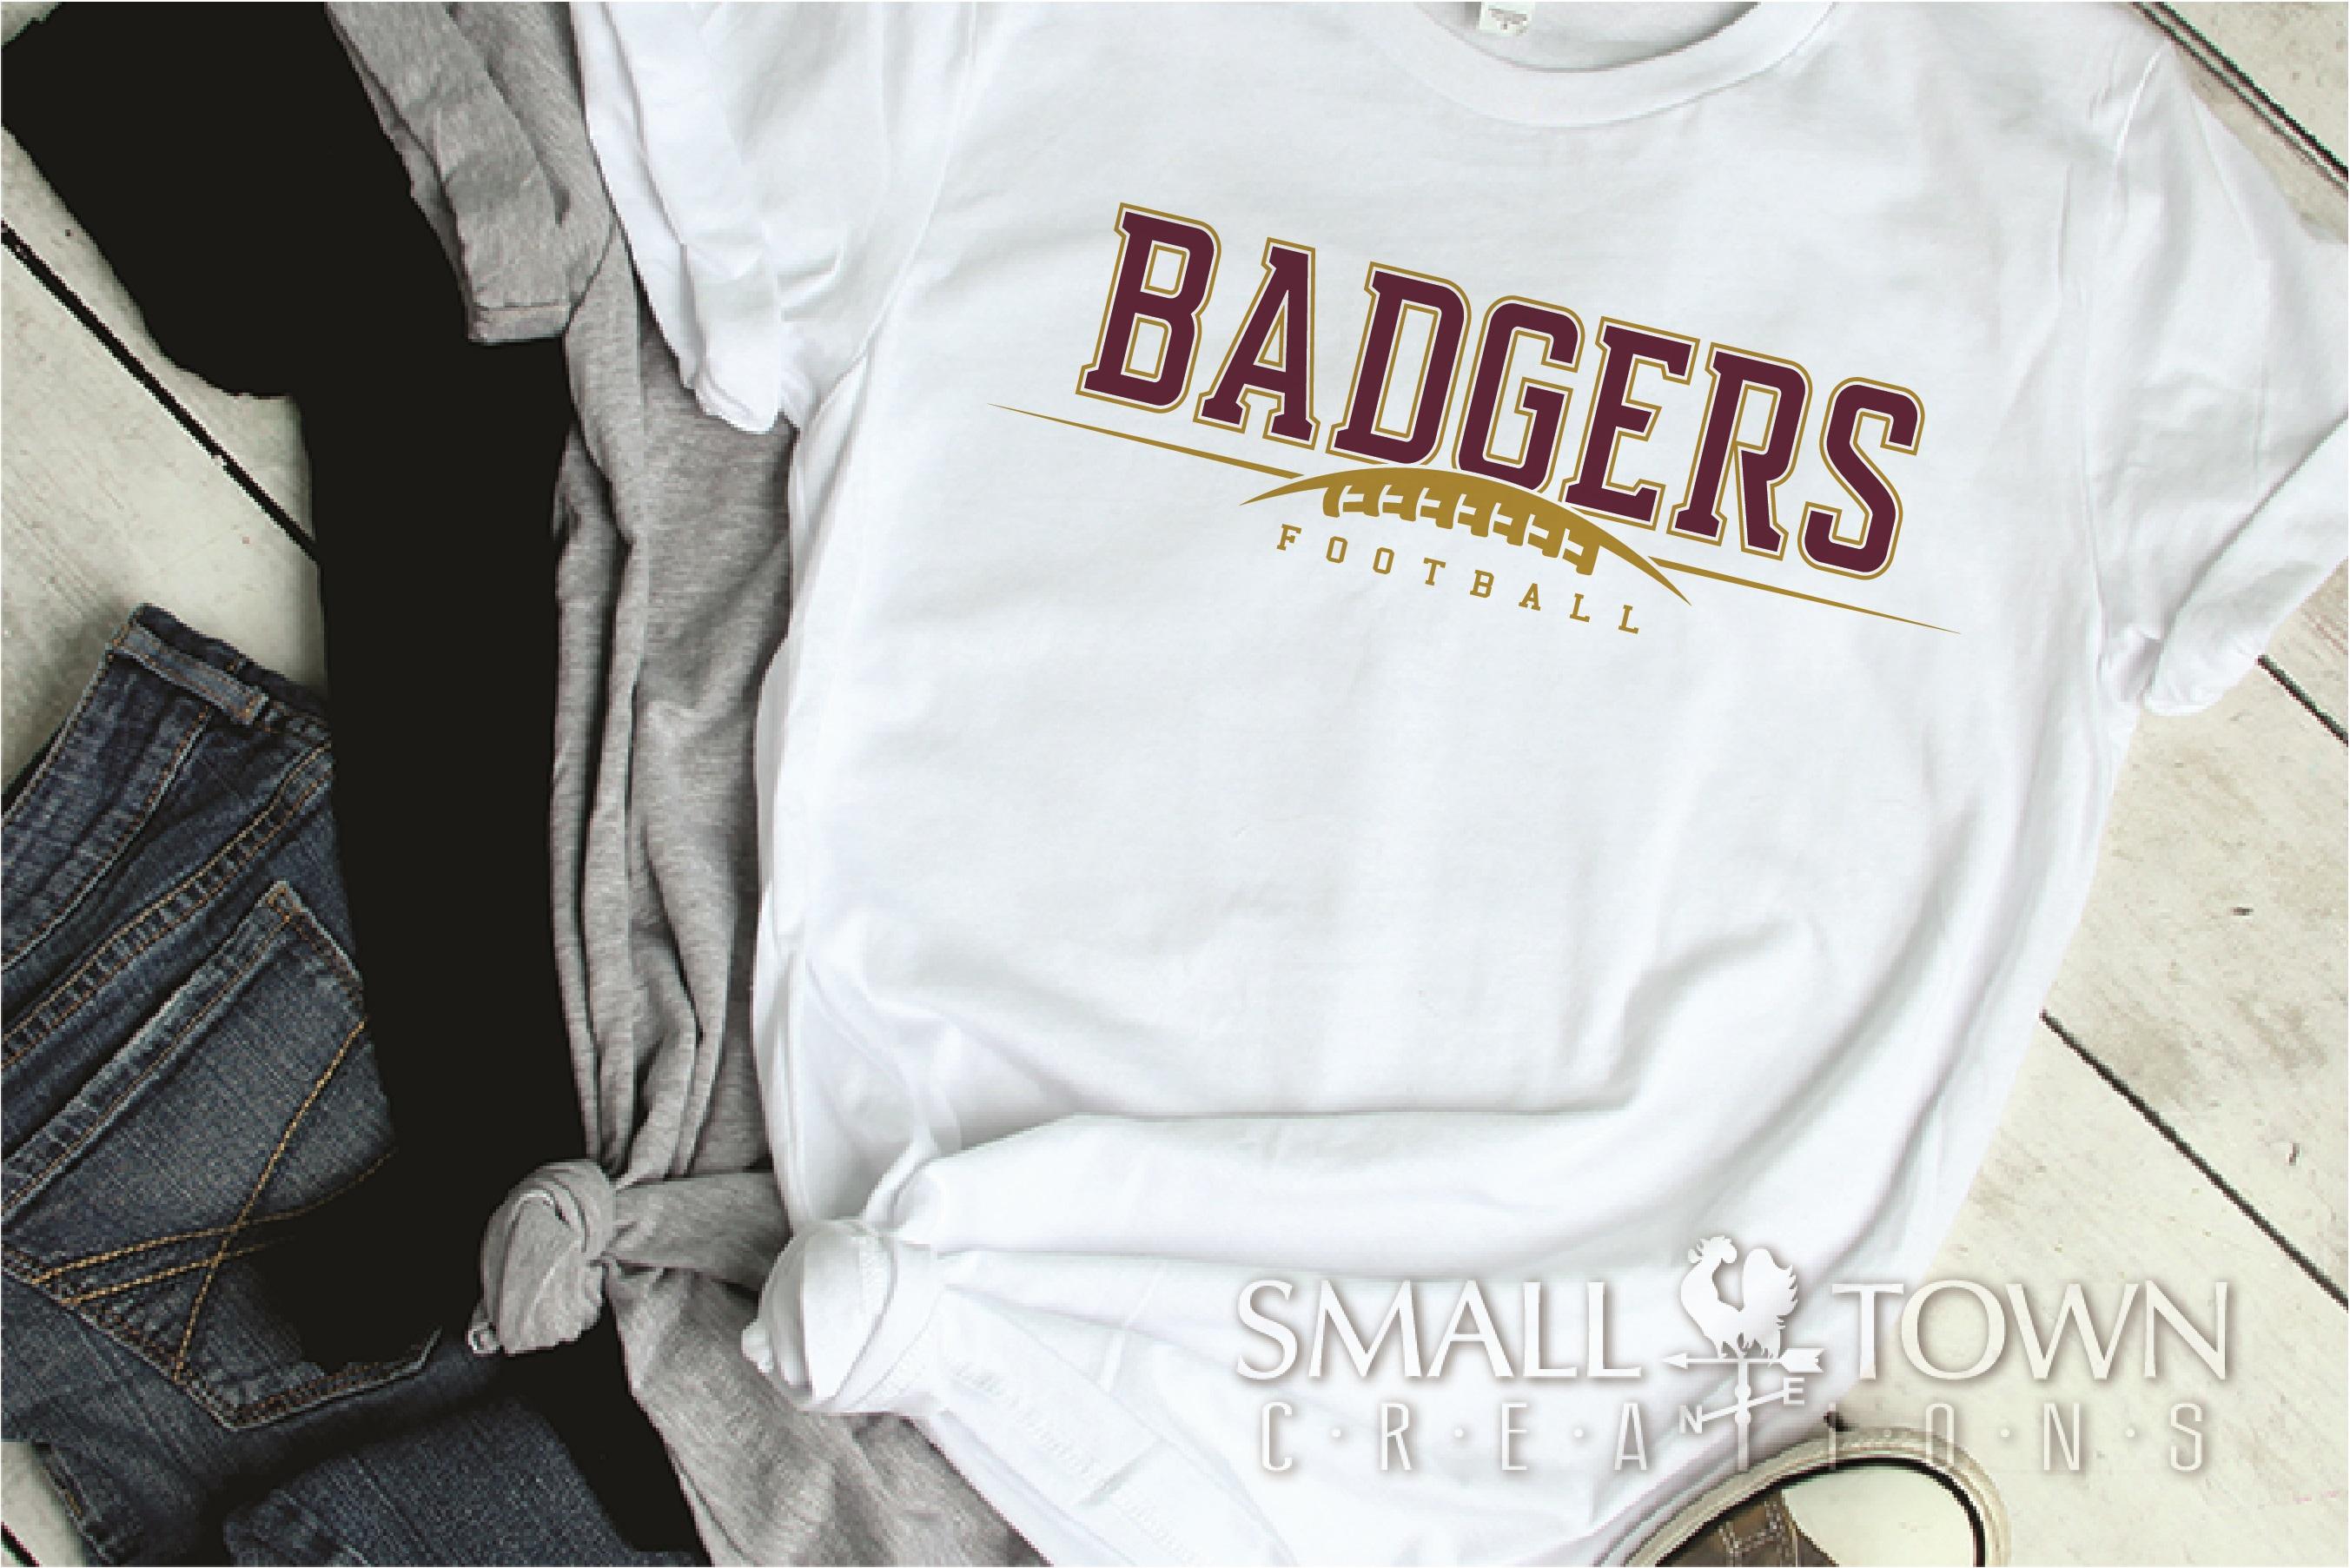 Badger, Badger Football Team, Sport, PRINT, CUT & DESIGN example image 2